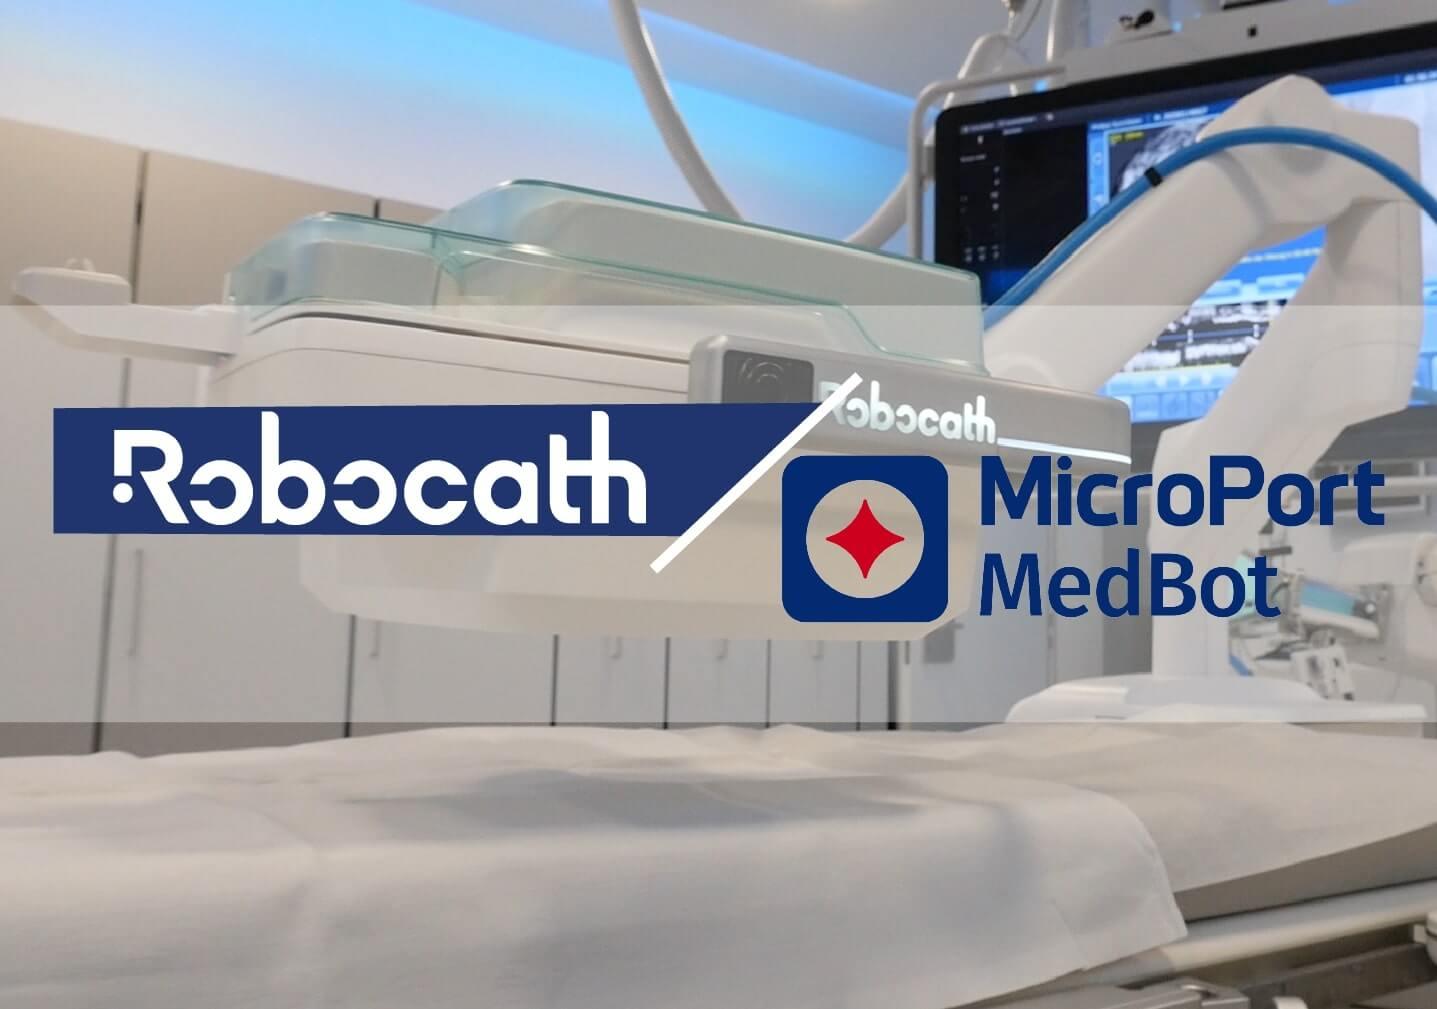 MicroPort Medbot